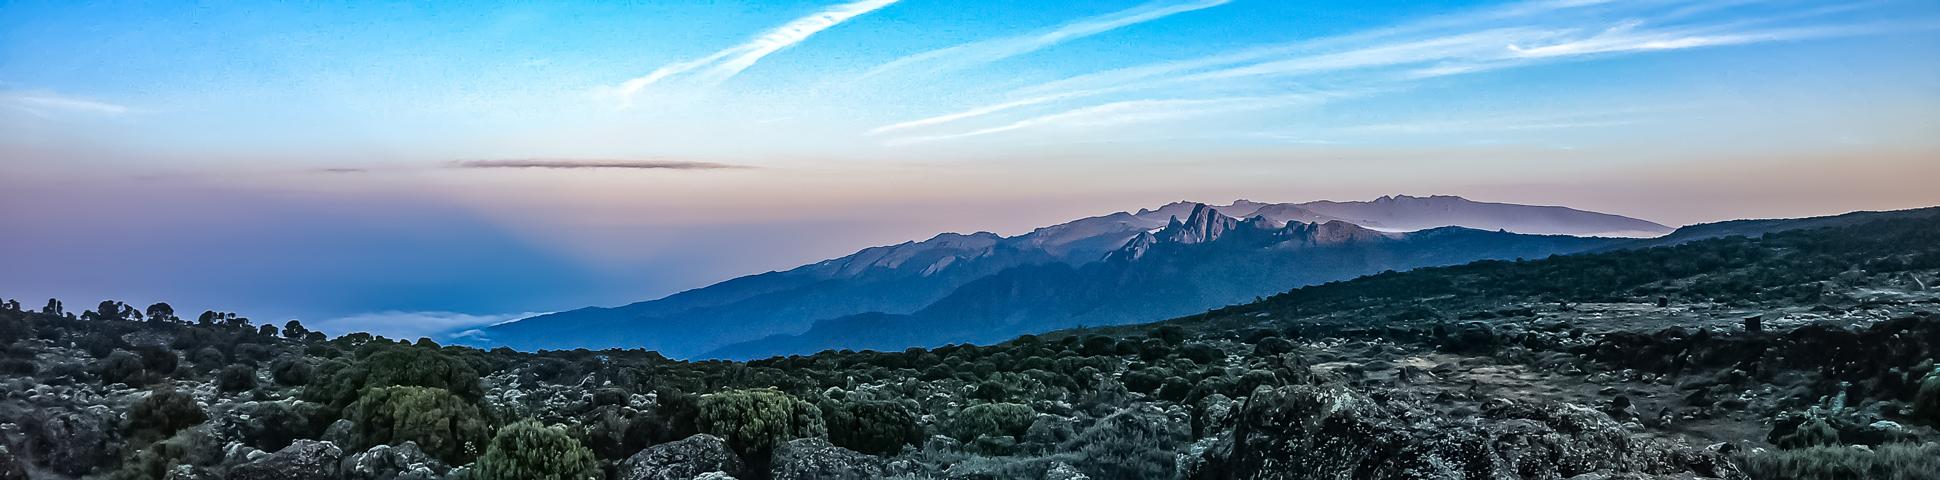 7-Day Mount Kilimanjaro on Lemosho Route